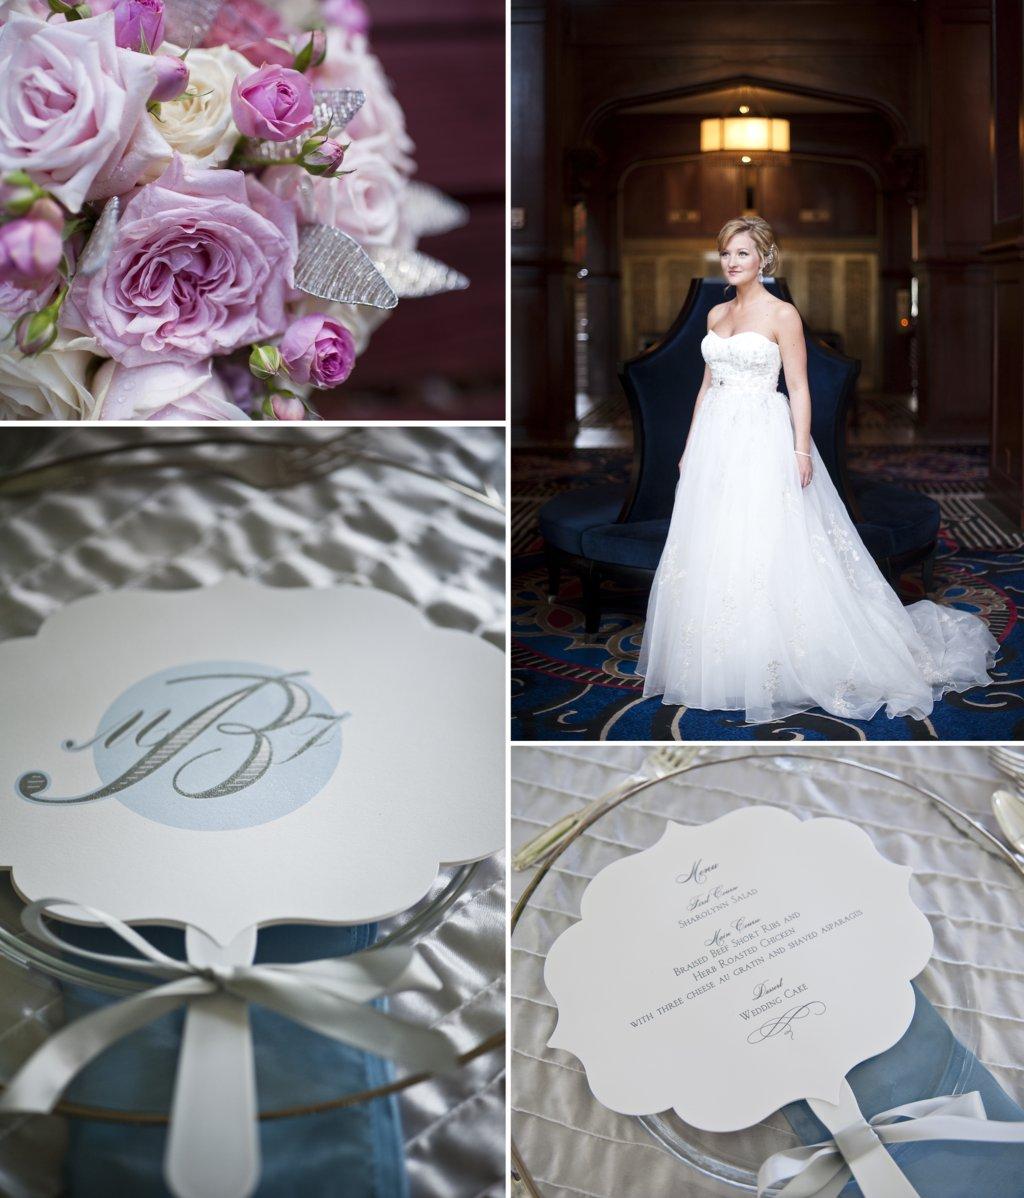 Classic-fall-wedding-elegant-bride-a-line-tulle-wedding-dress-monogram-ceremony-programs.full